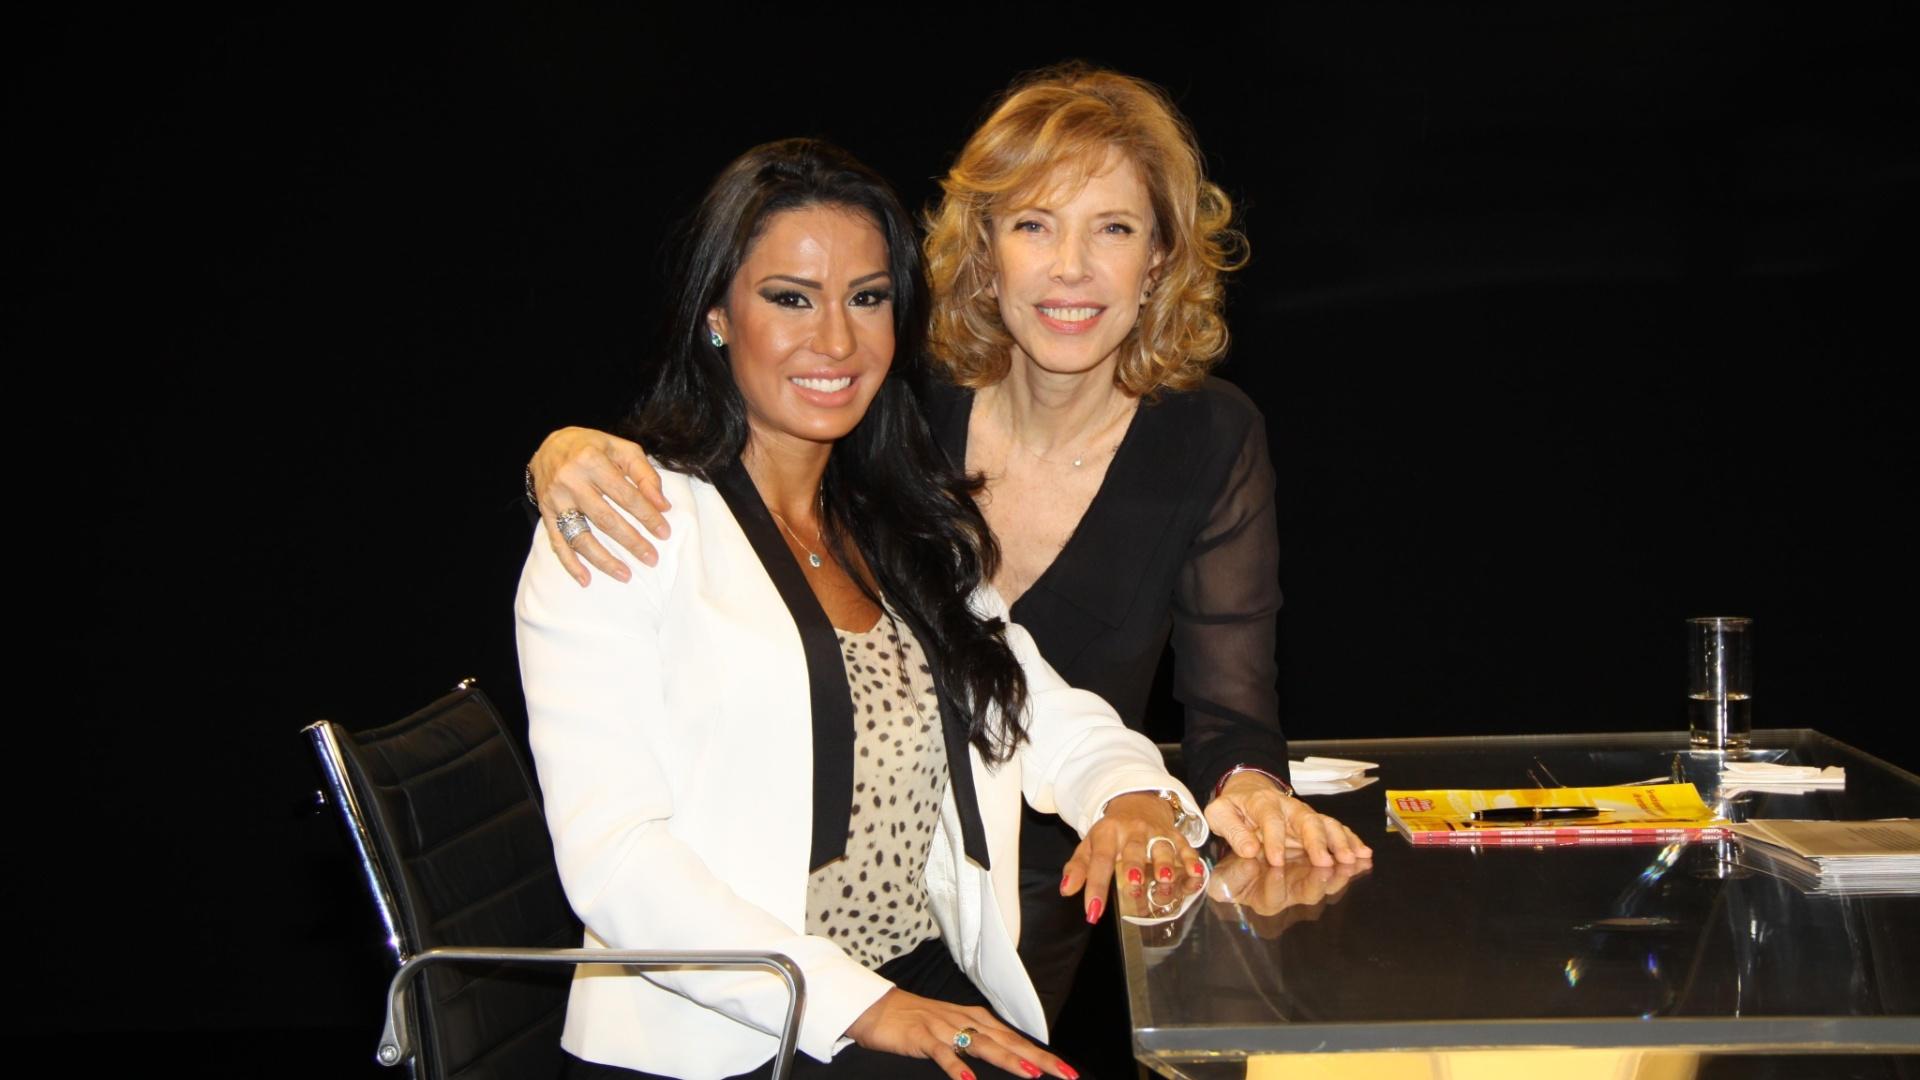 Gracyanne Barbosa é entrevistada por Marília Gabriela no